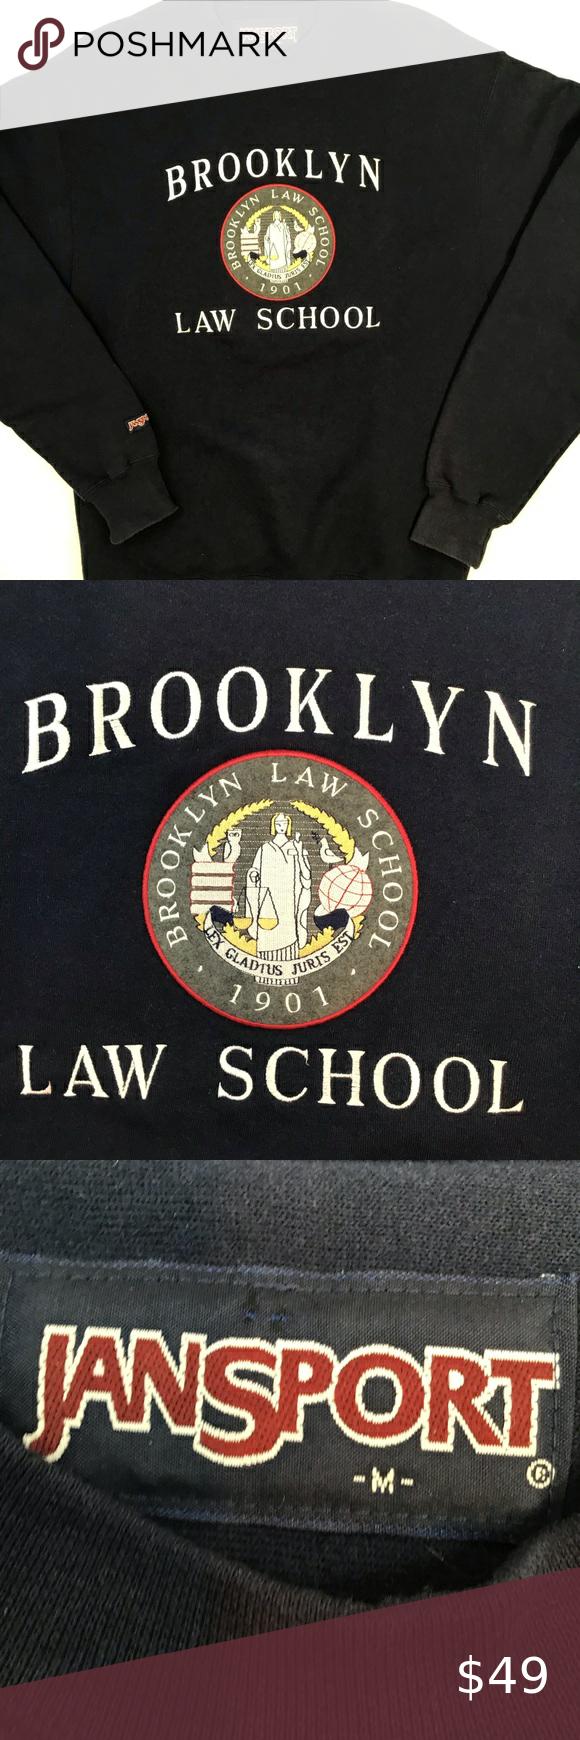 Vtg Brooklyn Law School Crewneck Vintage Brooklyn Law School Crewneck Sweatshirt Dead Stock Never Worn Pris Sweatshirt Shirt Law School Crew Neck Sweatshirt